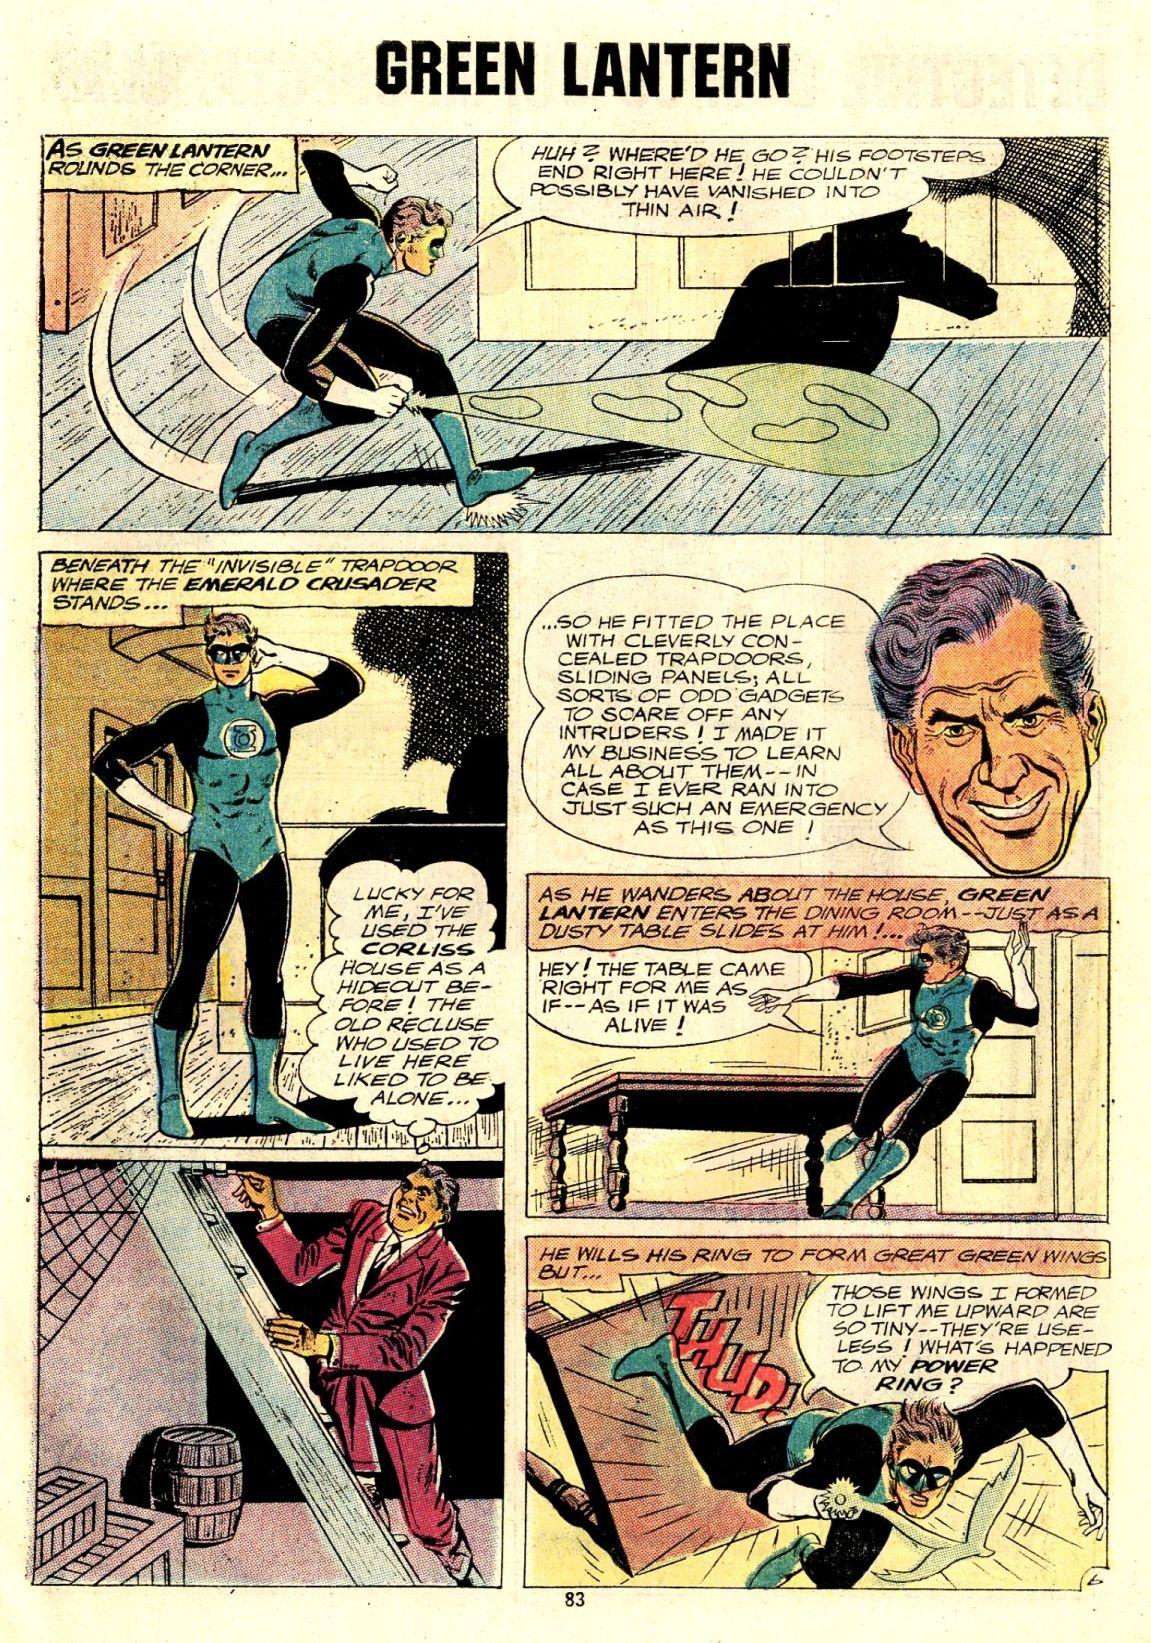 Detective Comics (1937) 438 Page 83